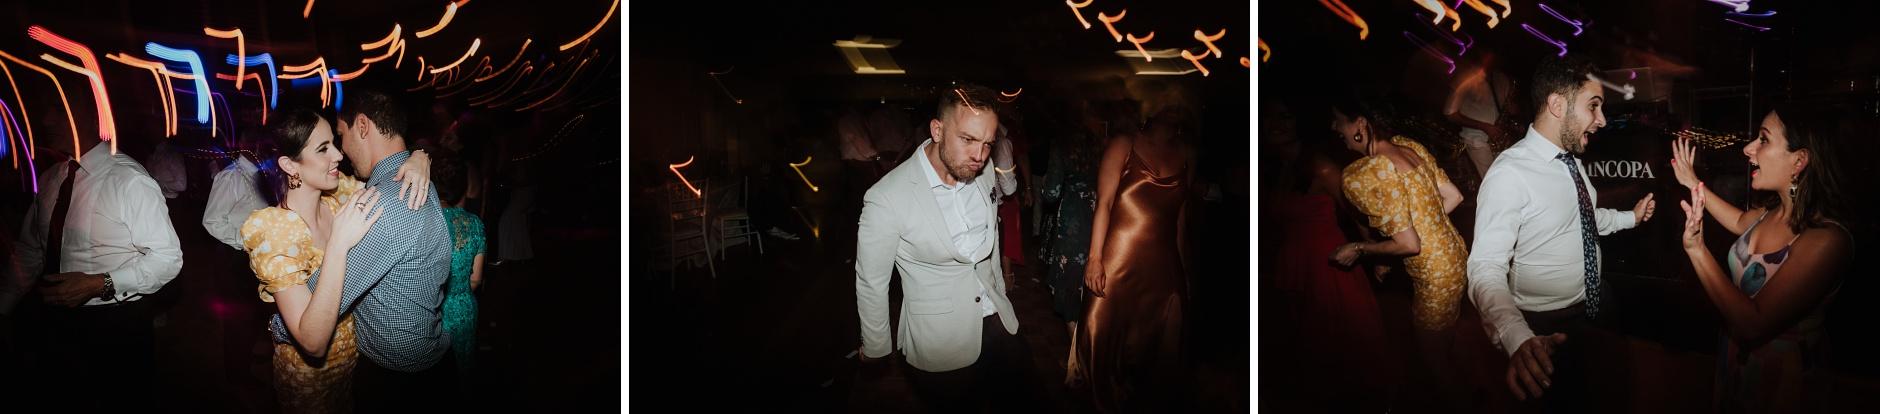 Sydney-Wedding-Photographer_0177.jpg